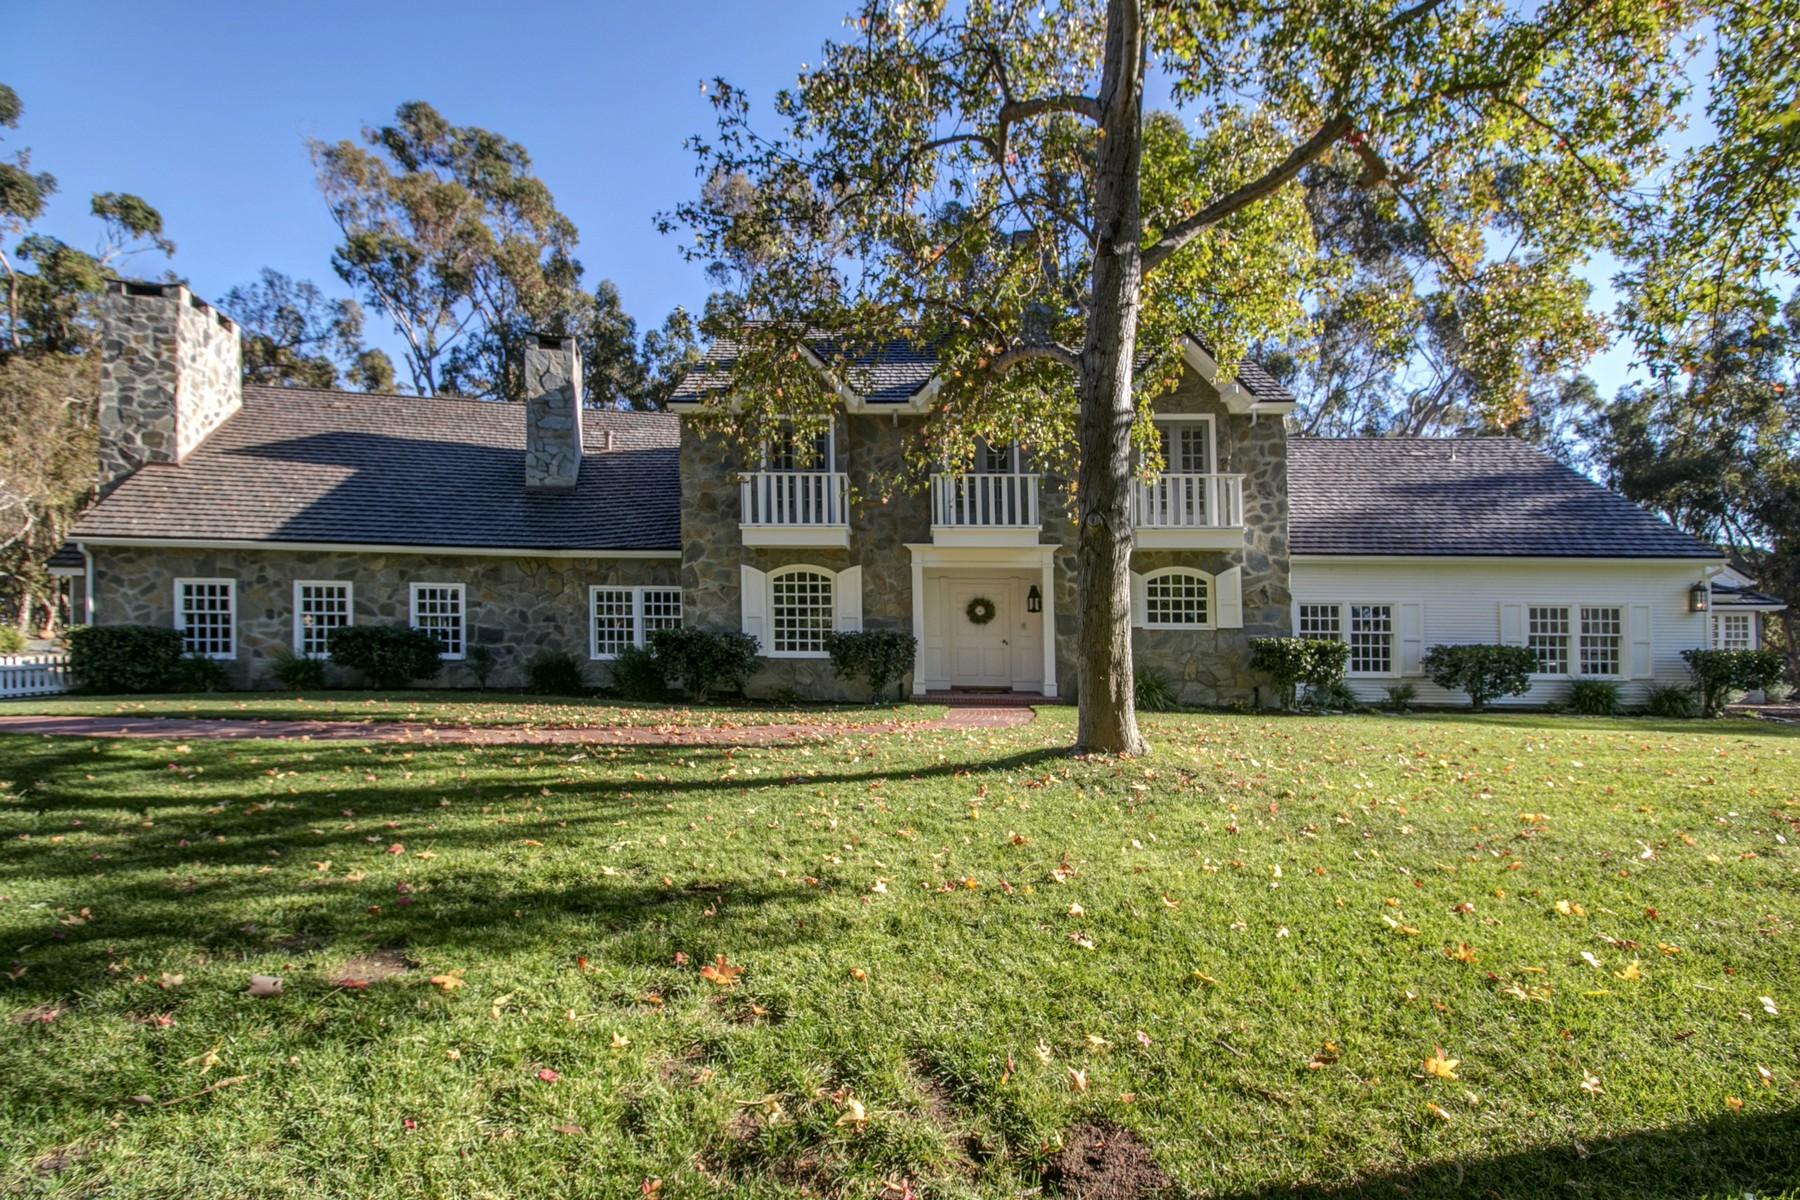 Single Family Home for Sale at 15152 Las Planideras Rancho Santa Fe, California 92067 United States